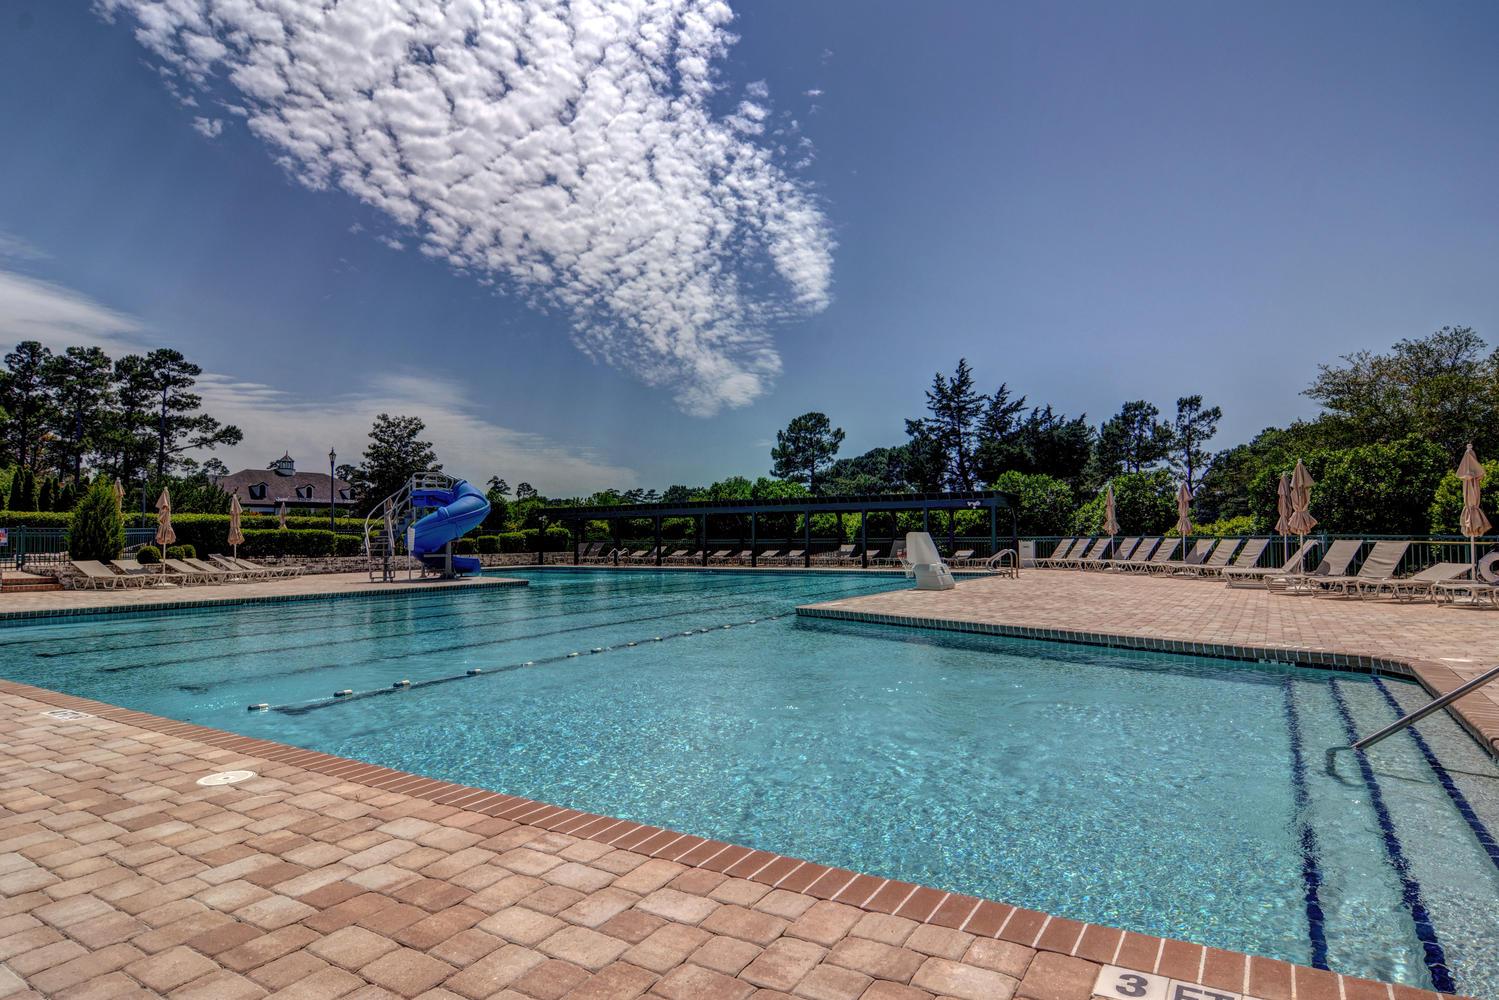 Wilmington NC Swimming Pool Communities | Wilmington NC Real ...